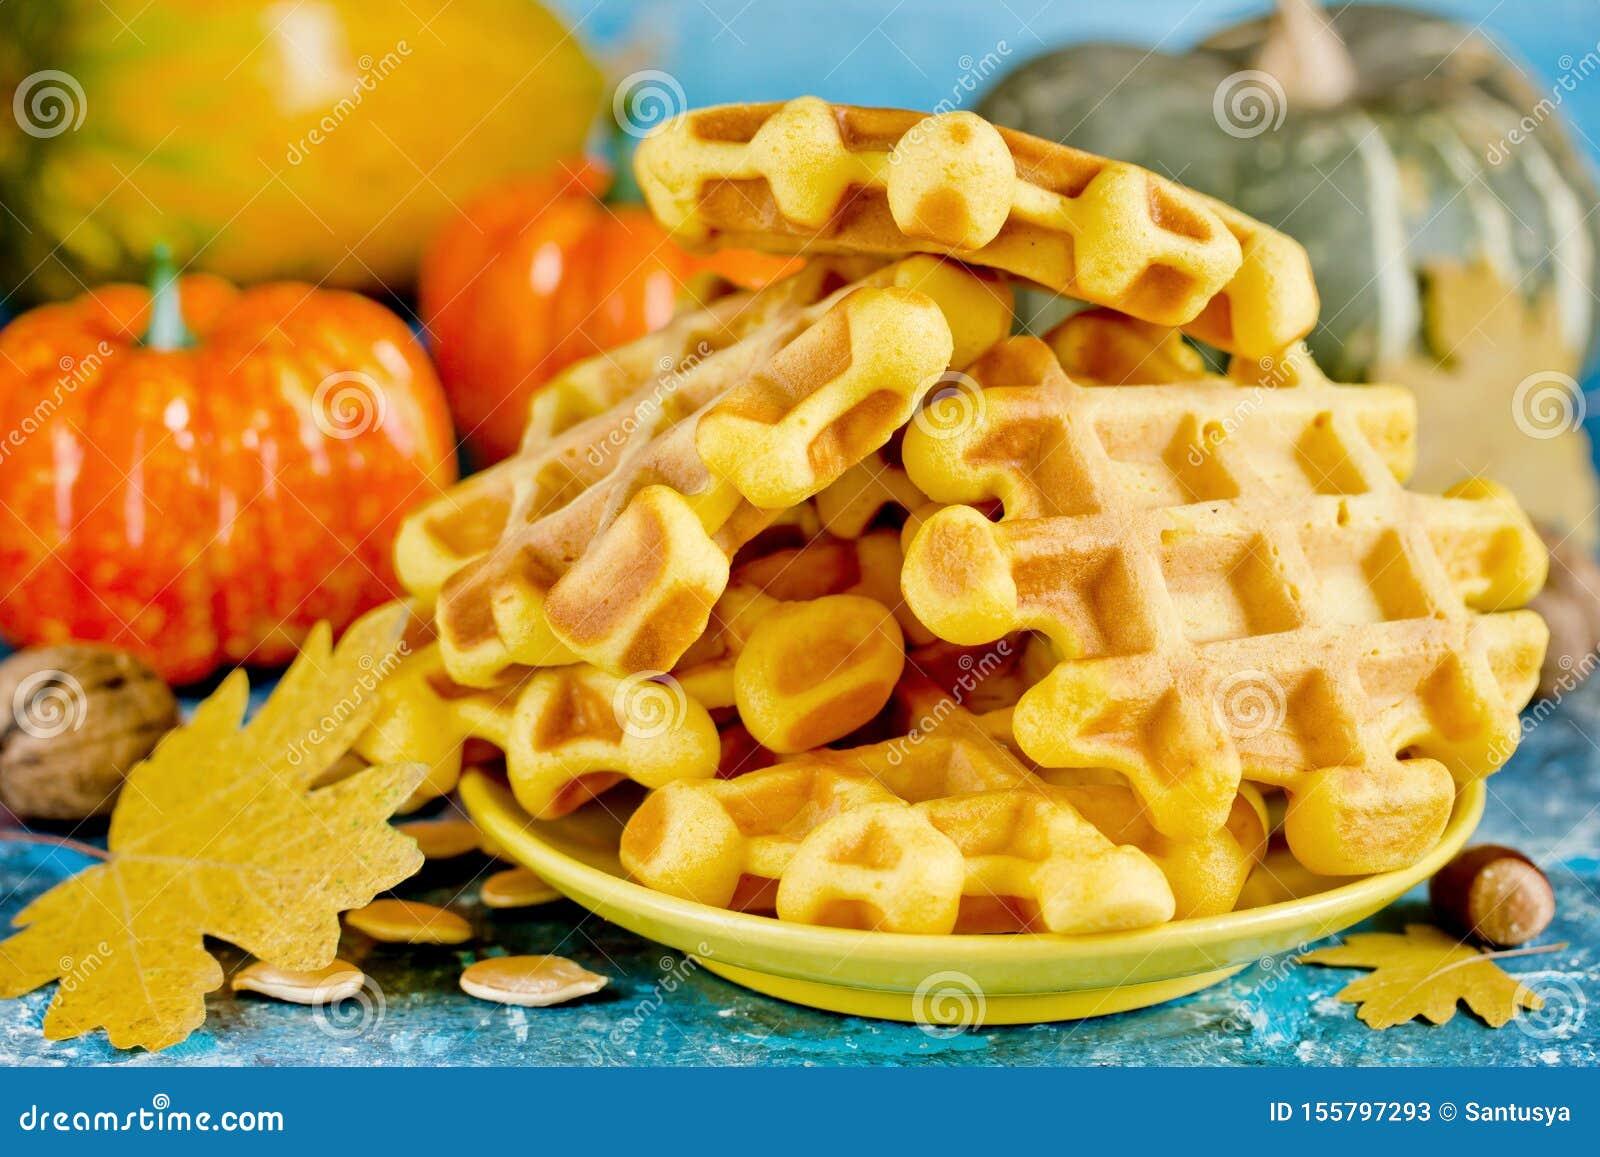 Pumpkin waffles, homemade sweet belgian waffles with pumpkin puree